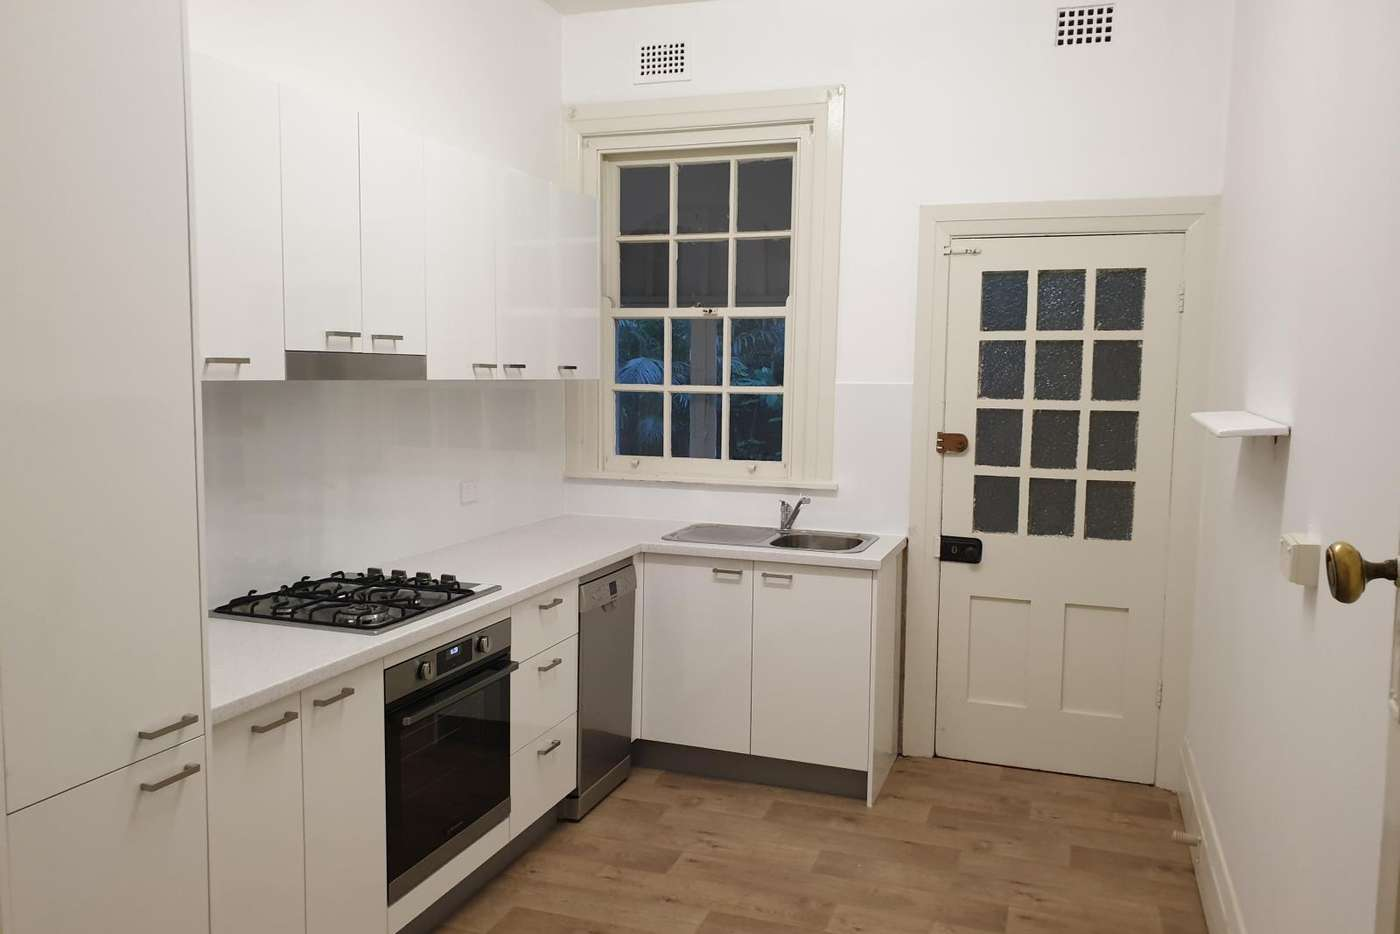 Seventh view of Homely apartment listing, 1/52 Sir Thomas Mitchell Road, Bondi Beach NSW 2026